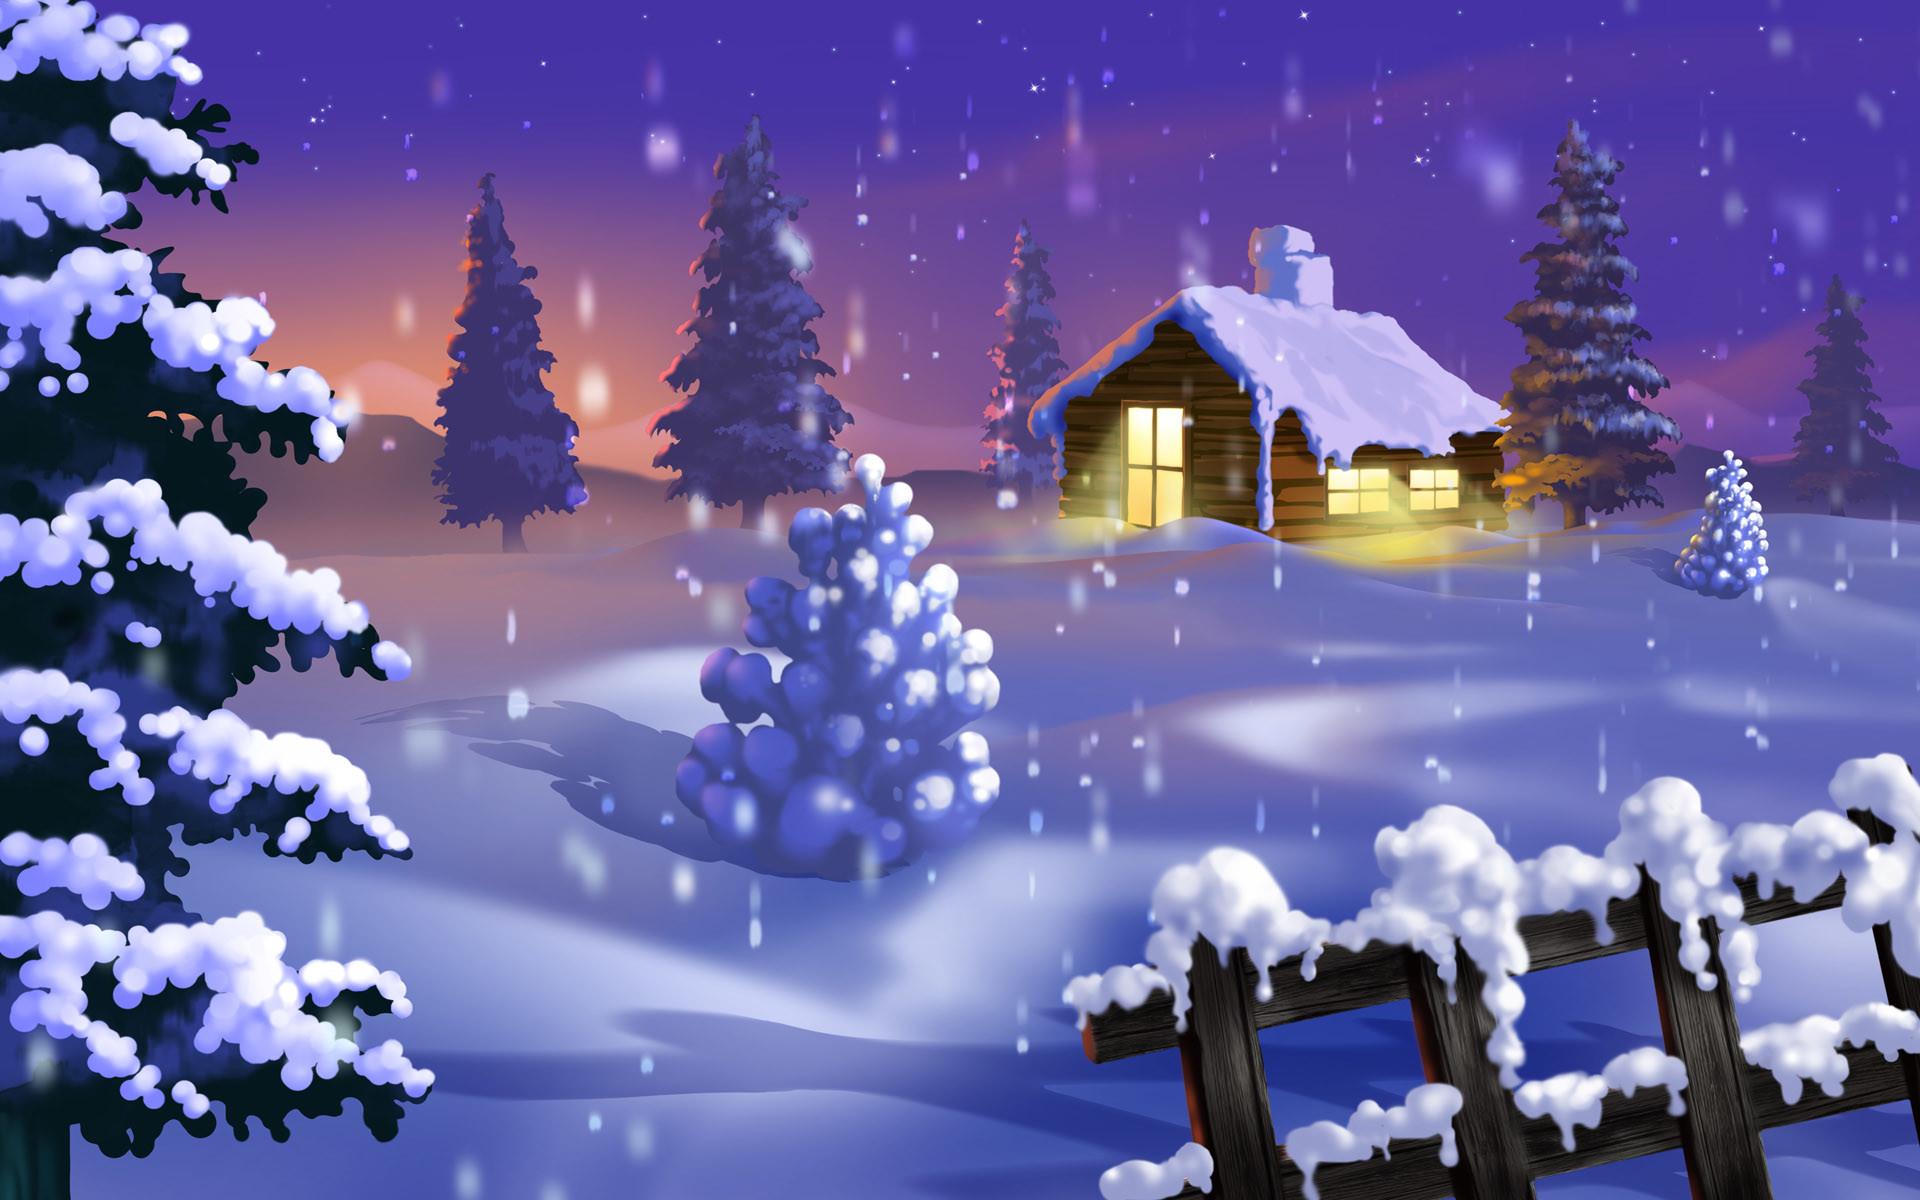 Holiday Wallpapers and Screensavers | Desktop Image